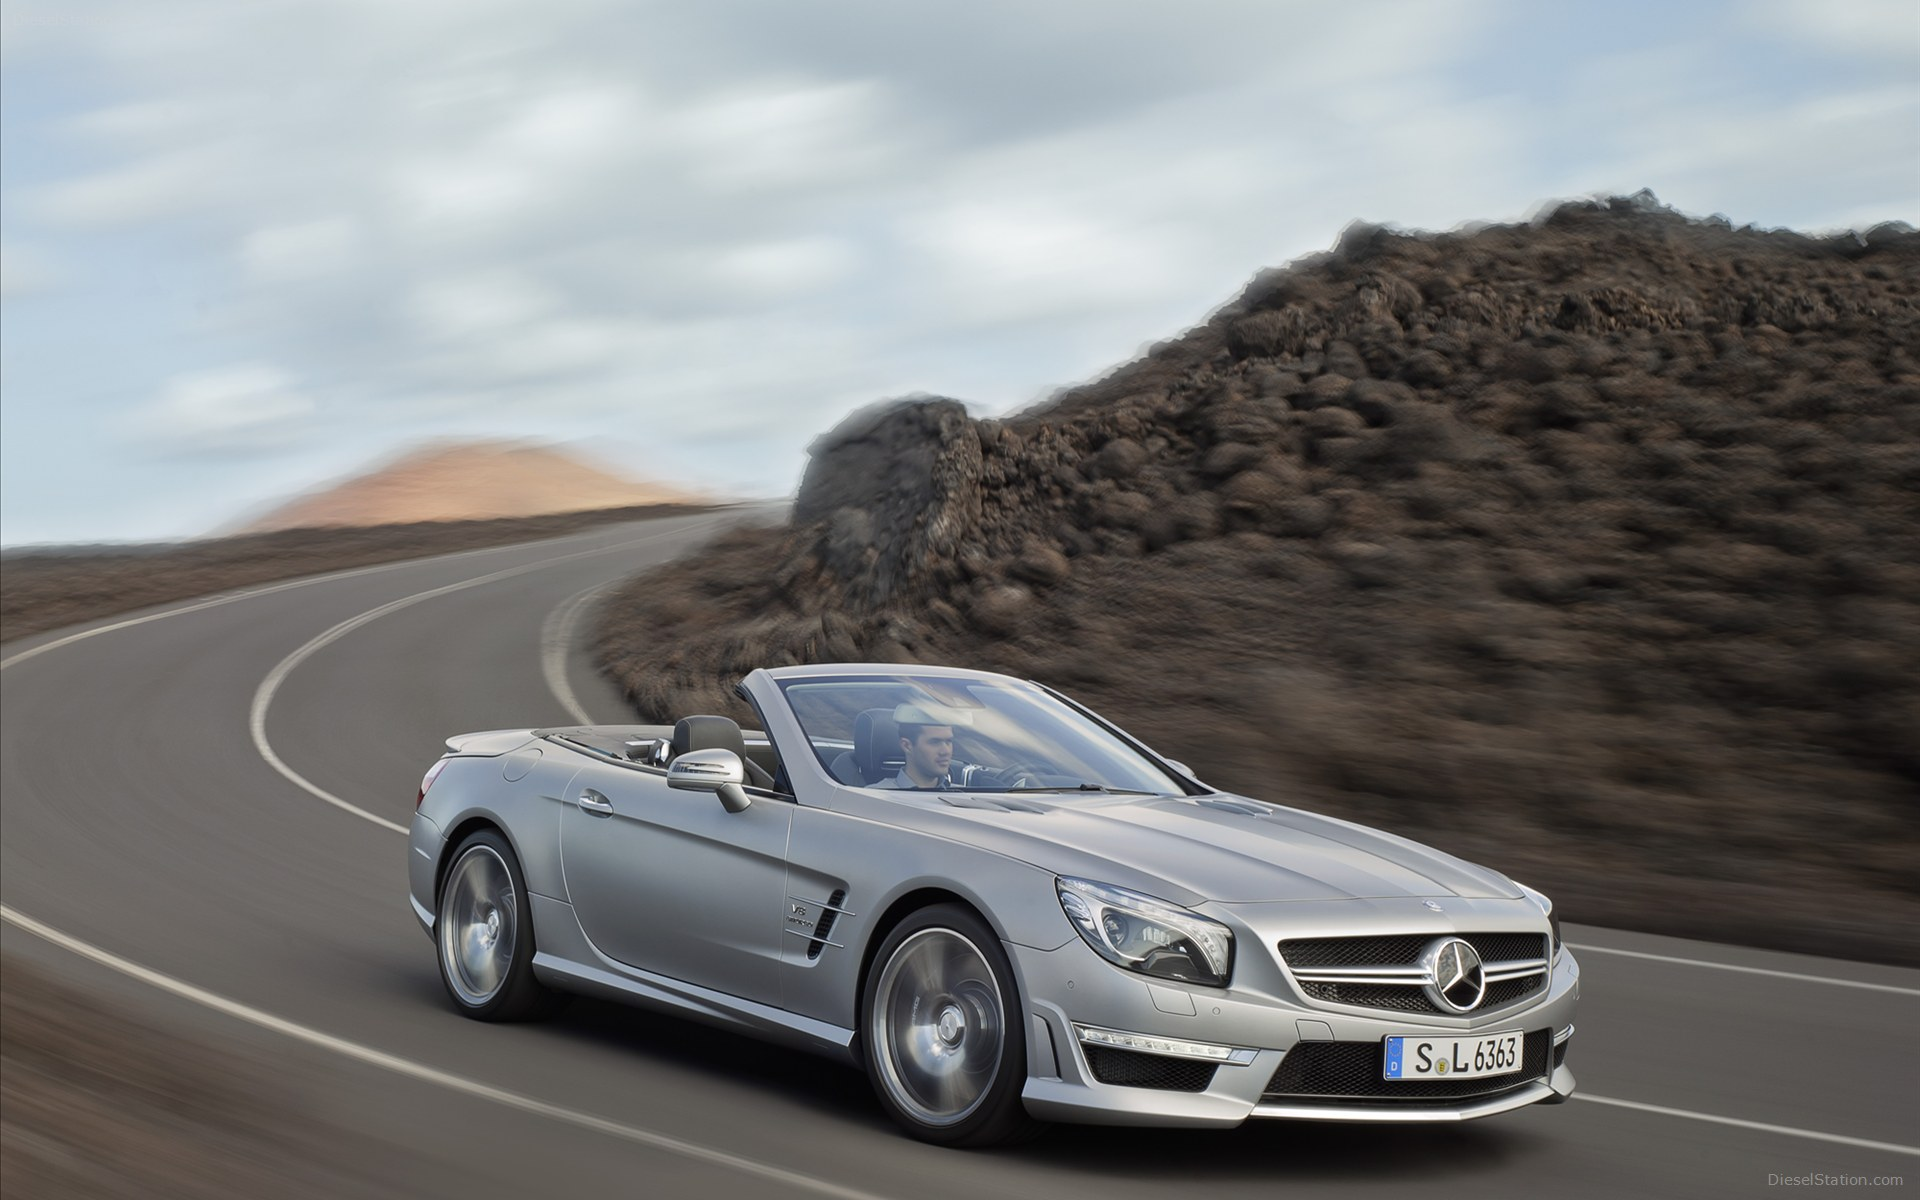 Exceptionnel Mercedes Benz SL63 AMG3